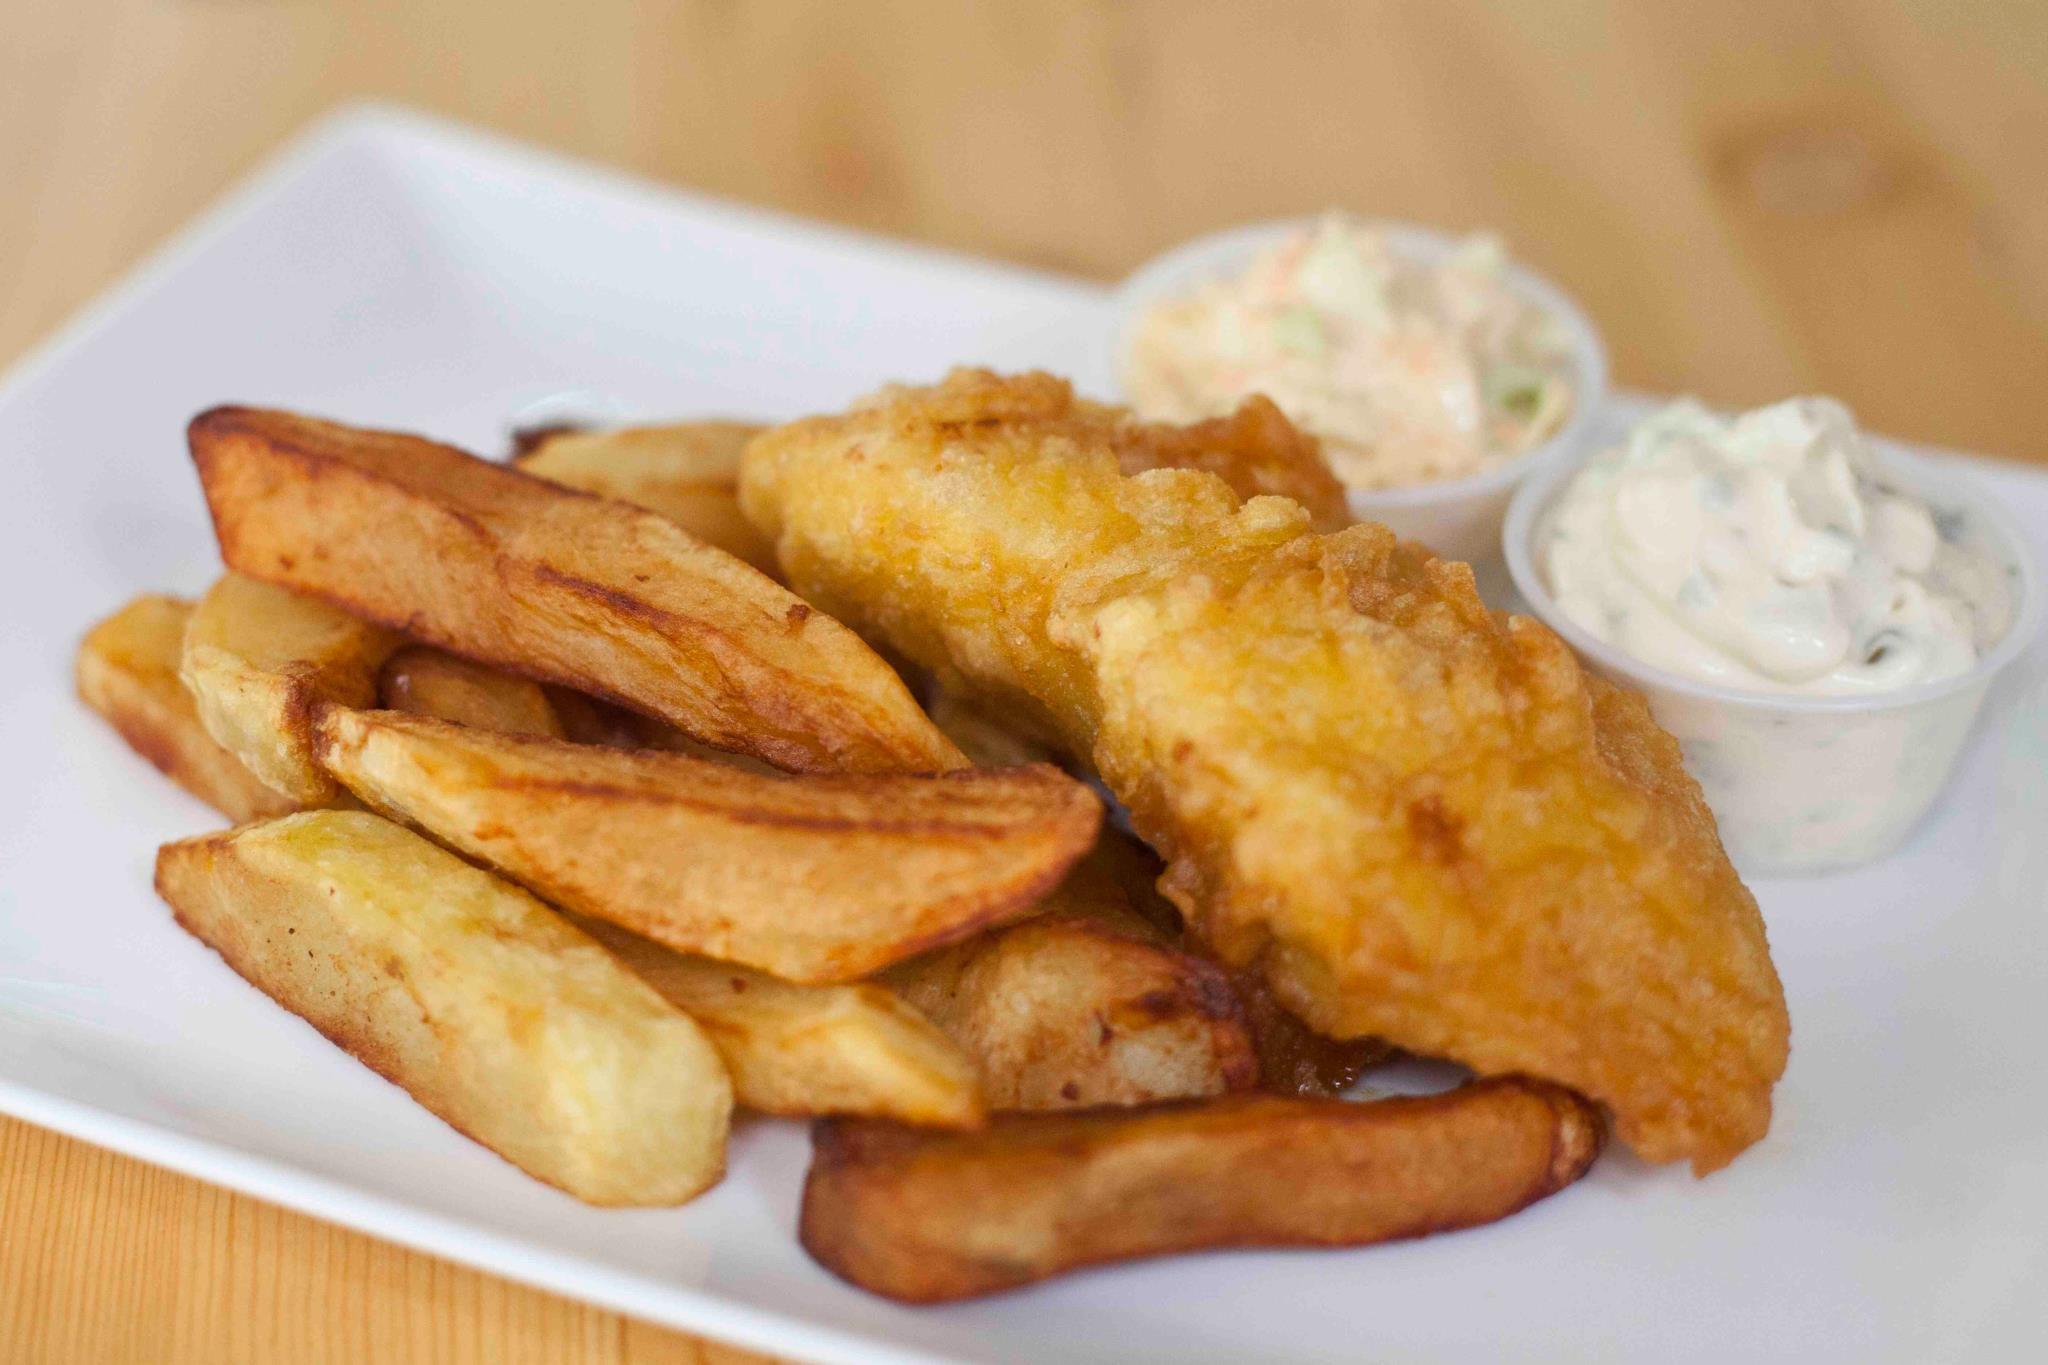 fish sticks and fries